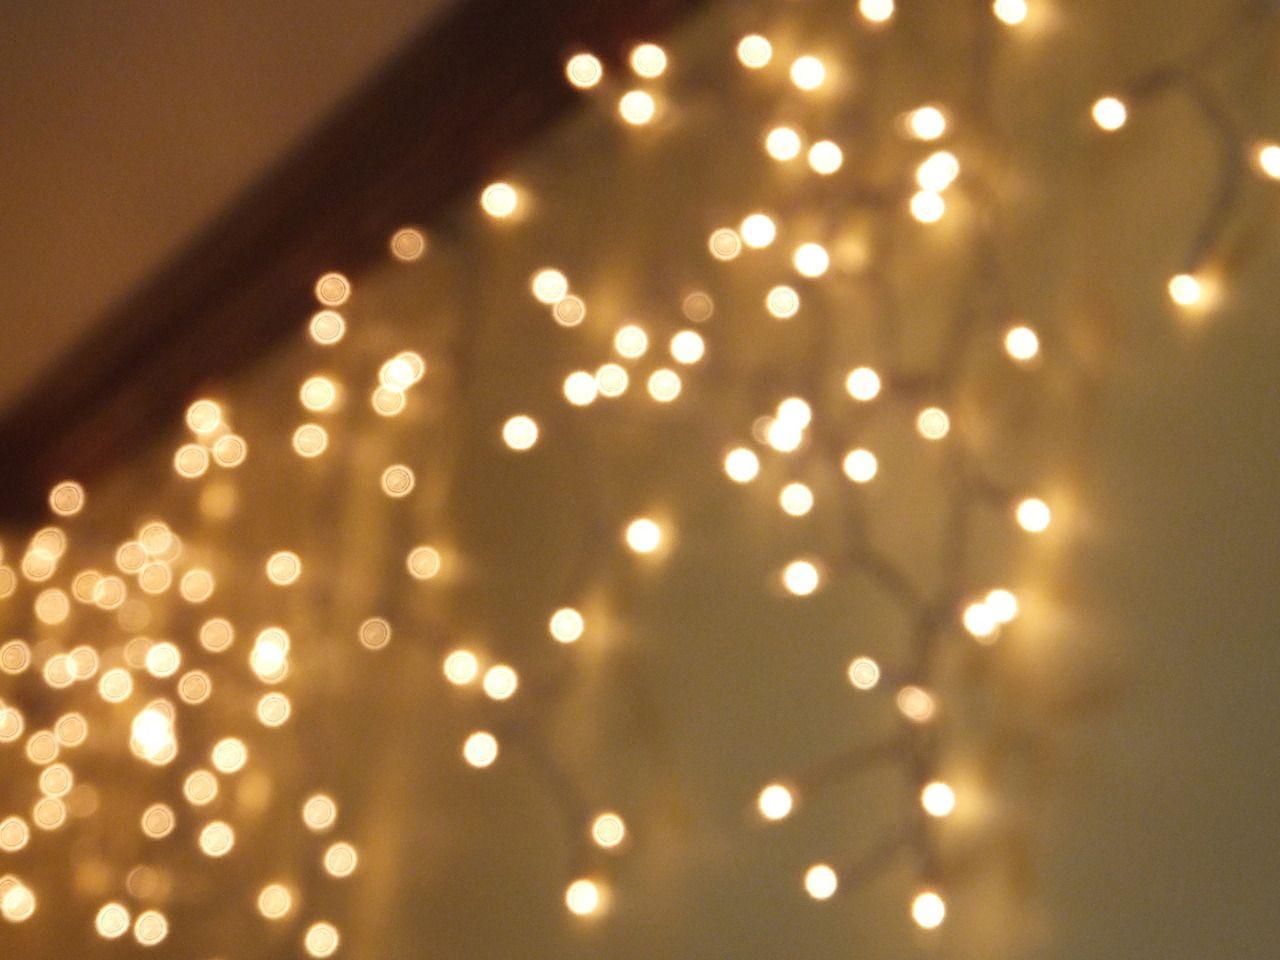 Pink christmas lights in bedroom - Image For Christmas Lig Hts Photography Tumblr Desktop Wallpaper